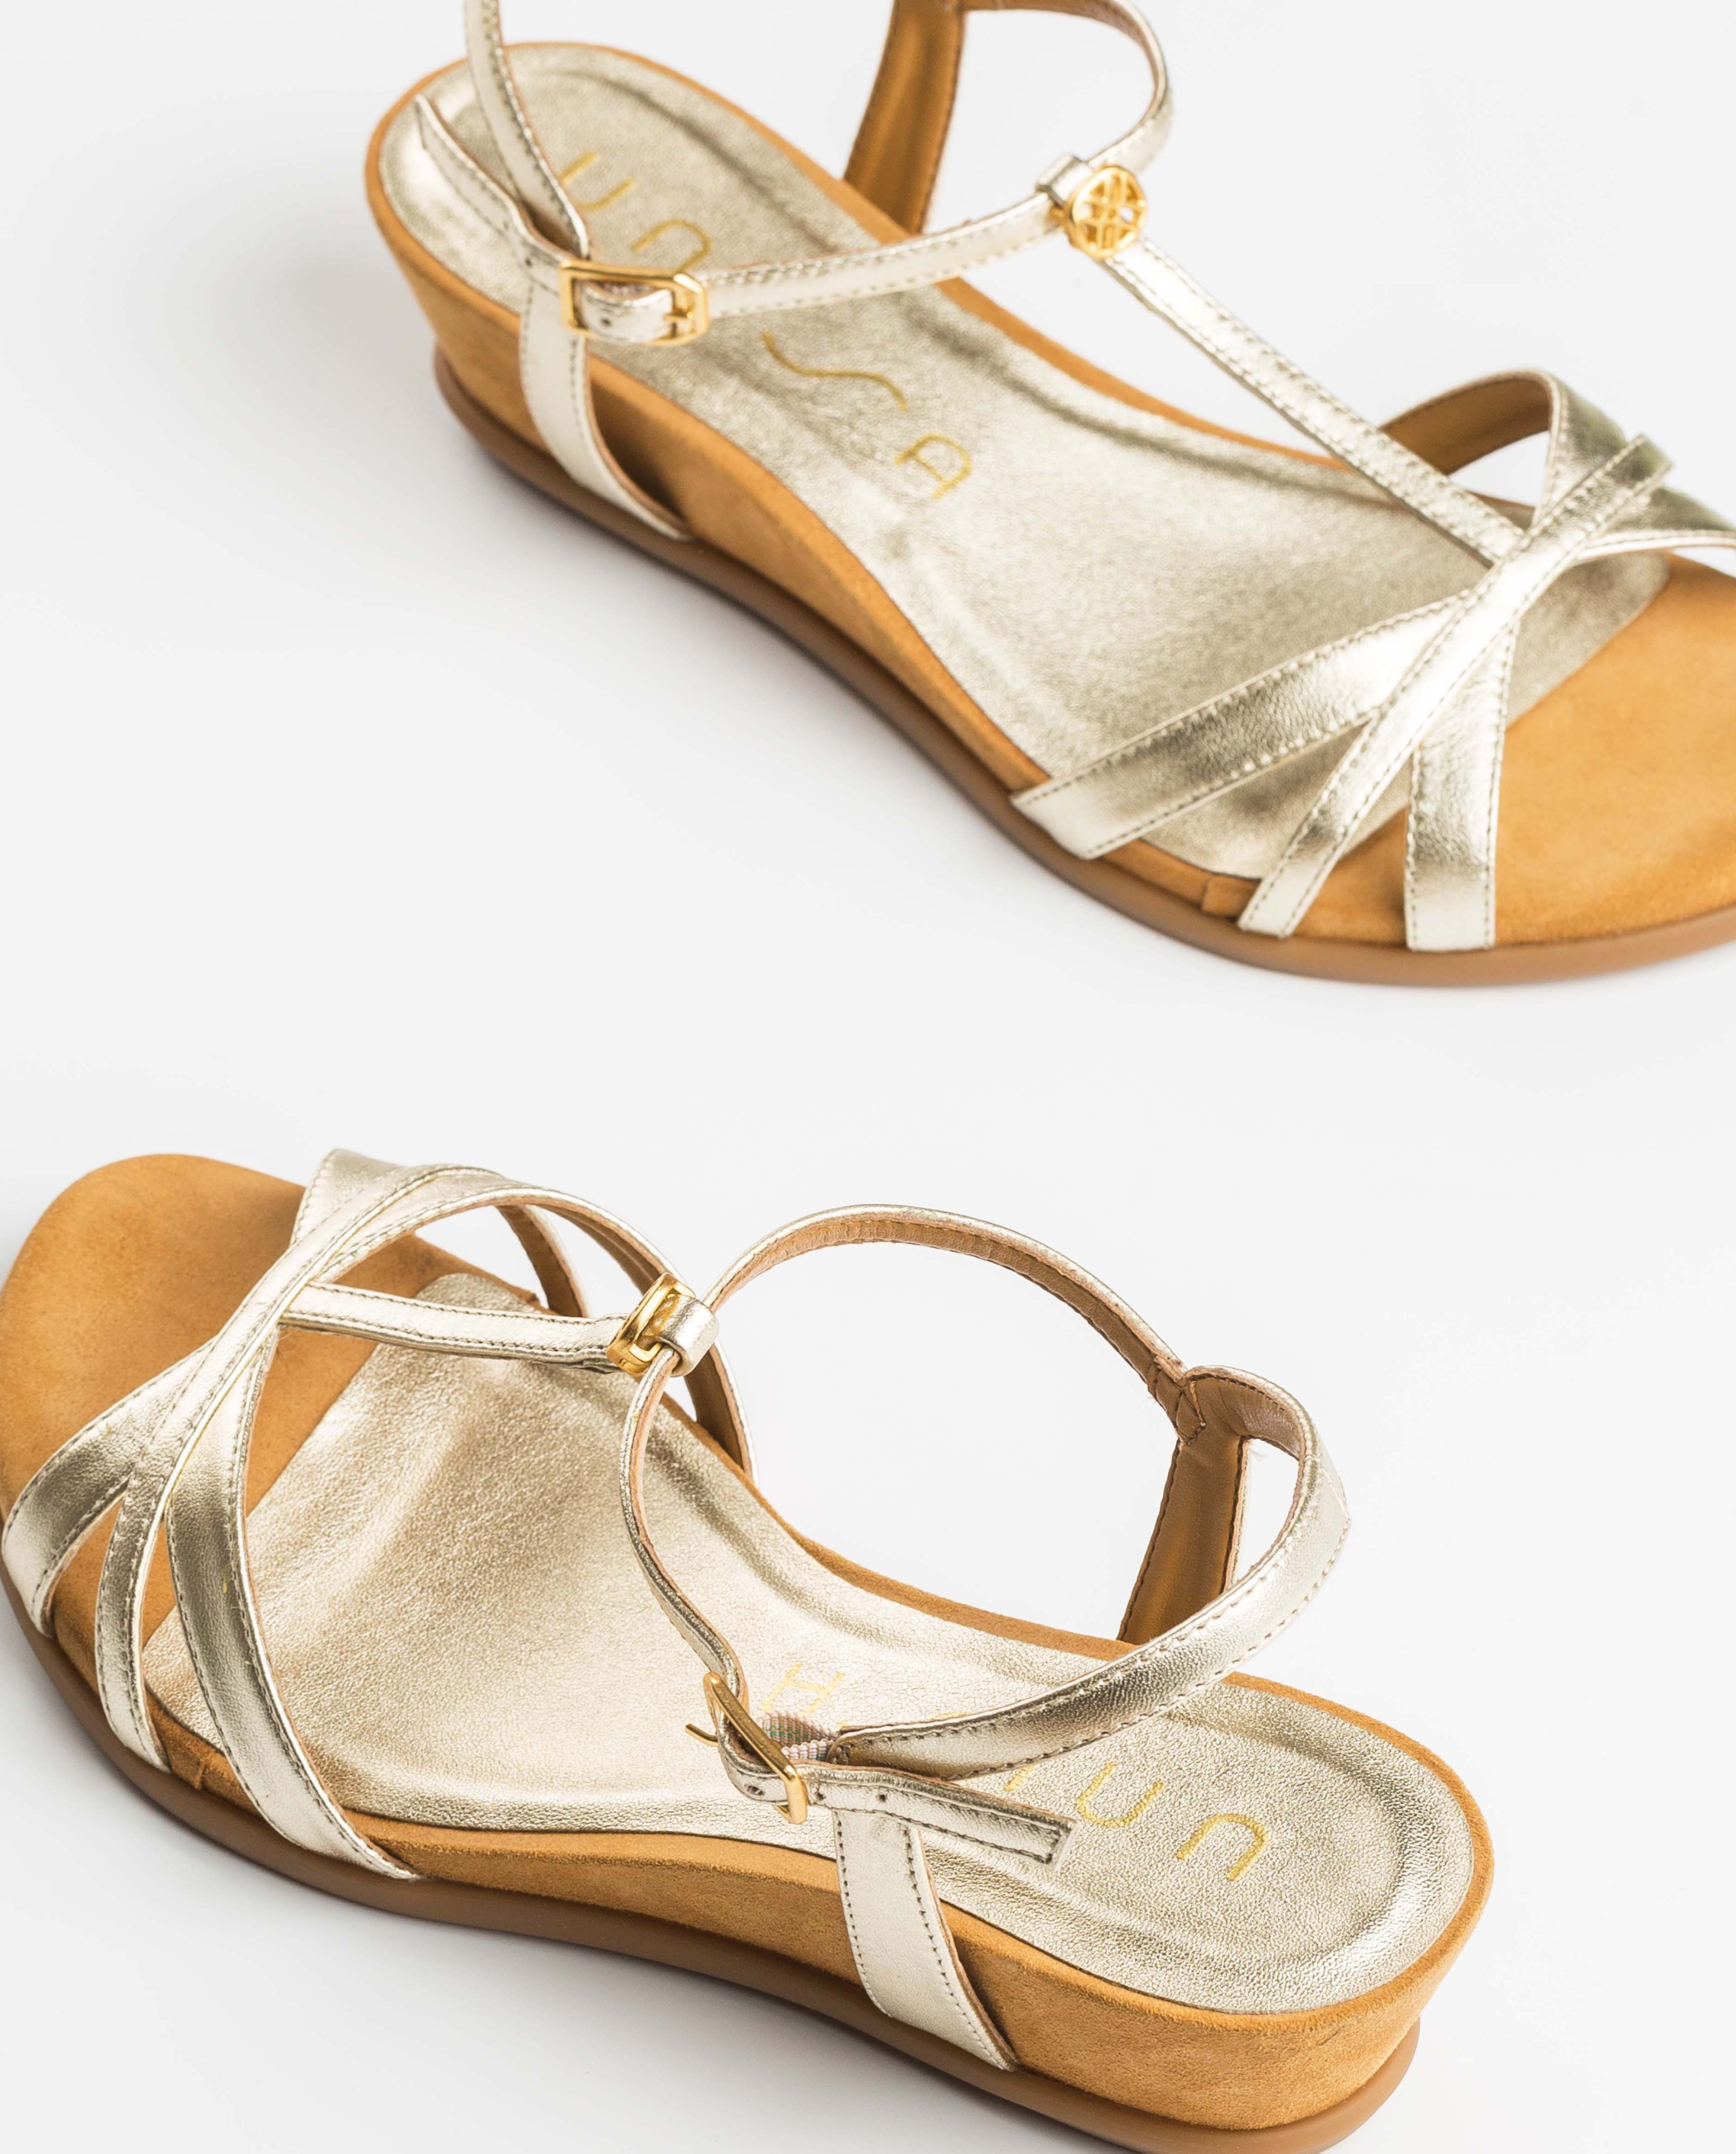 UNISA Sandales dorées monogramme BINAR_LMT platino 3